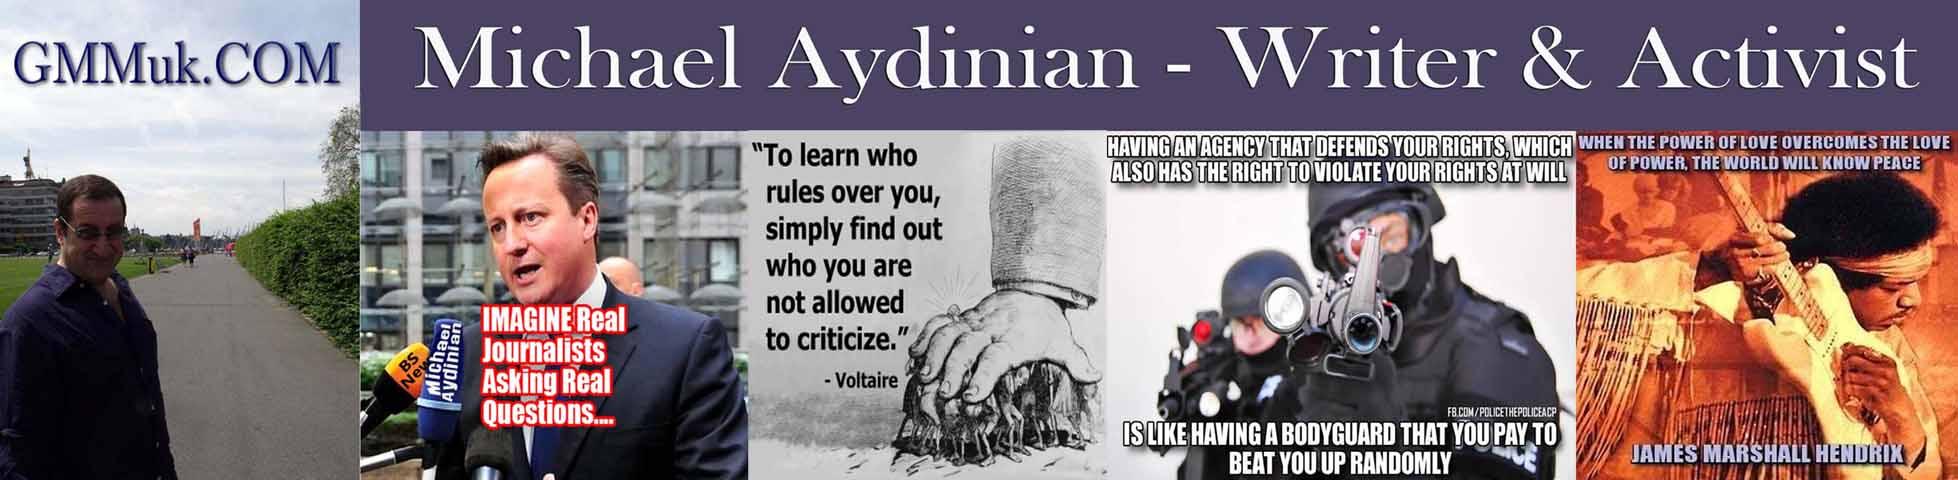 GMMuk – Michael Aydinian